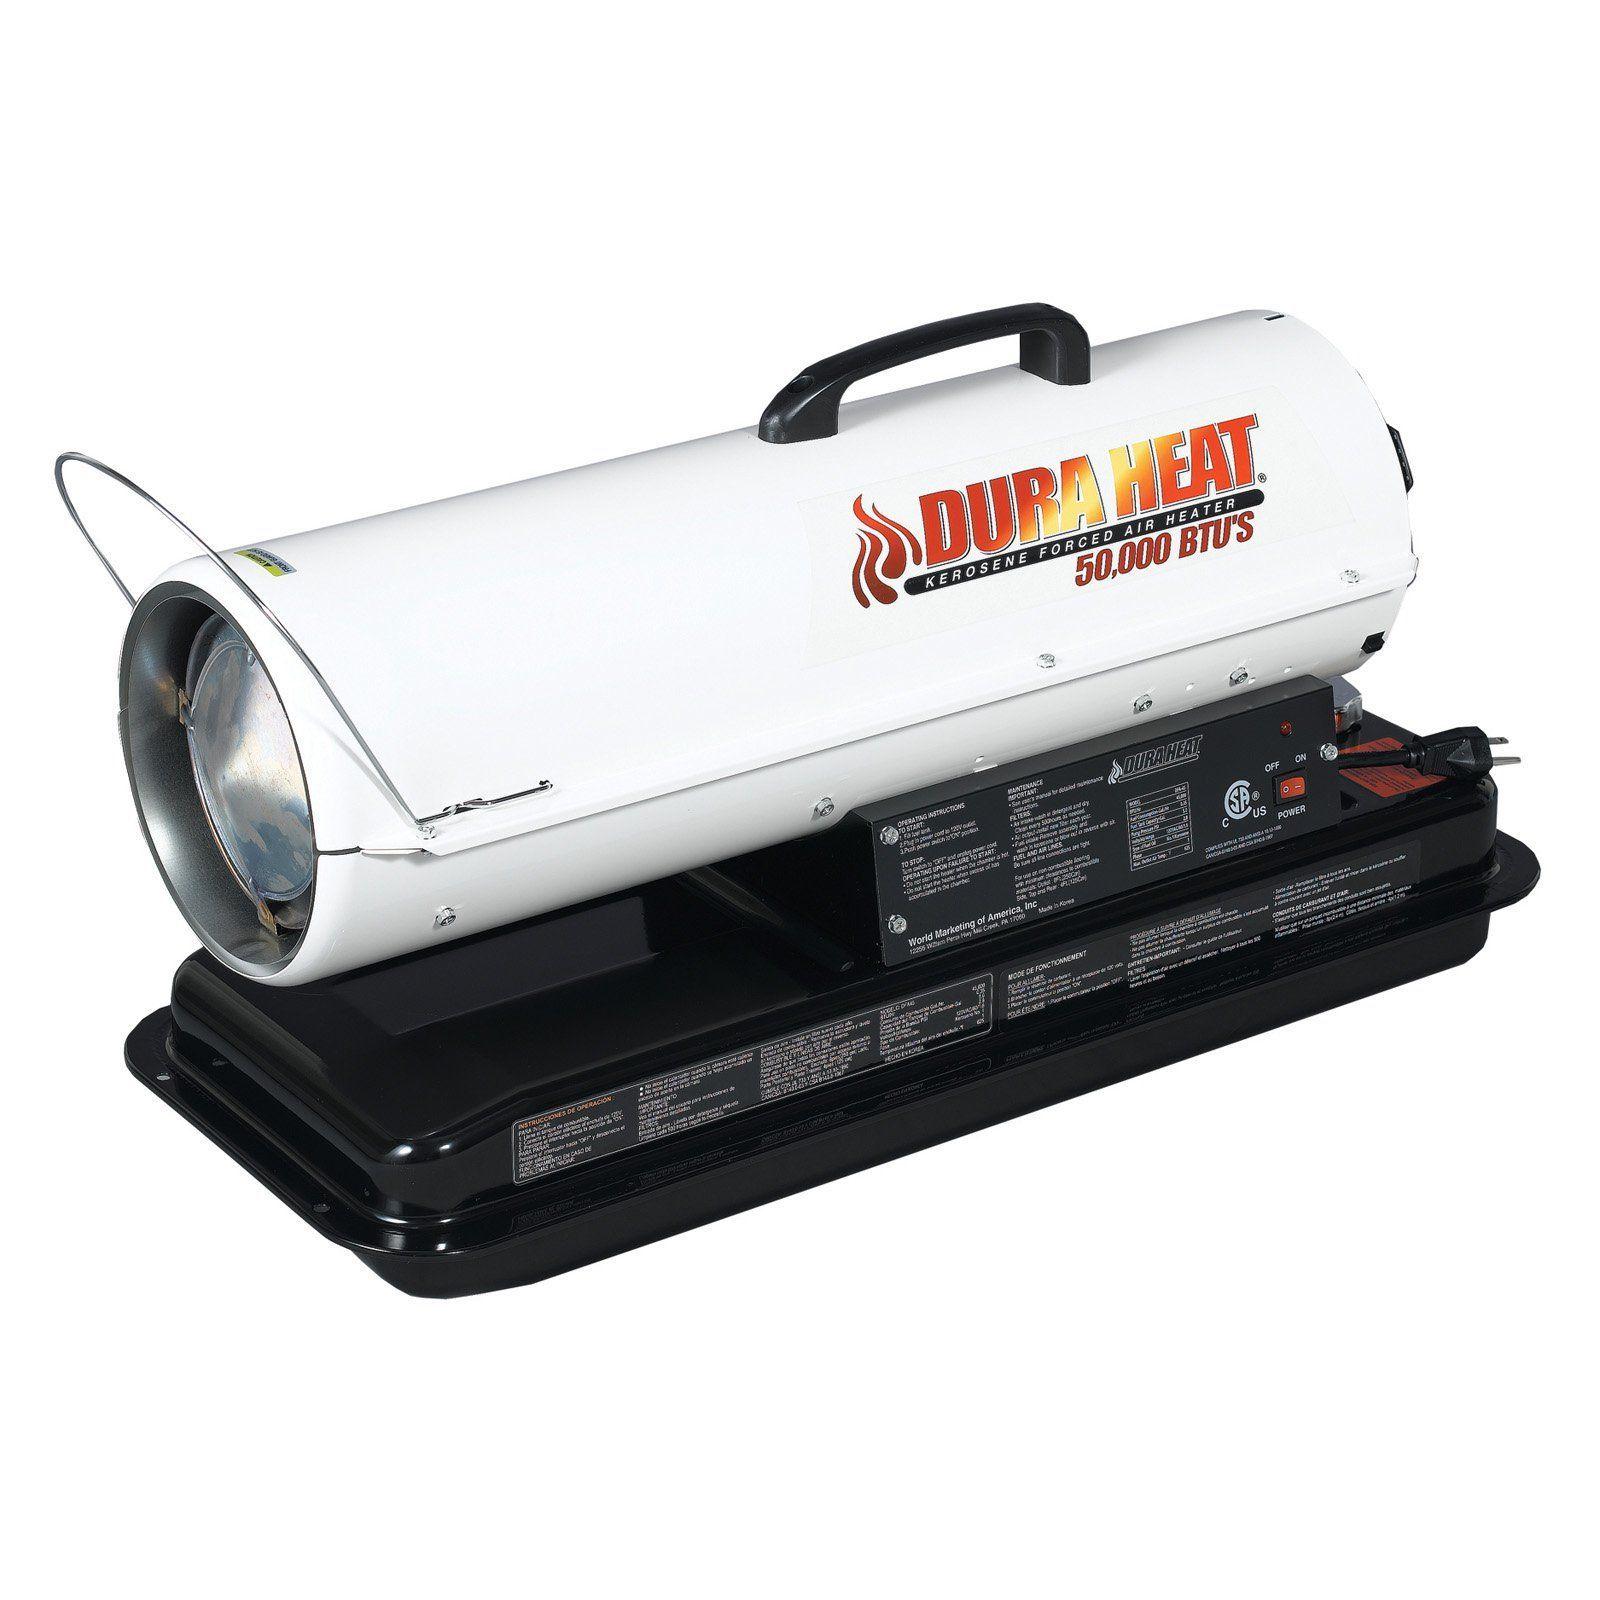 Dura Heat Heavy Duty Forced Air Utility Heater 50,000